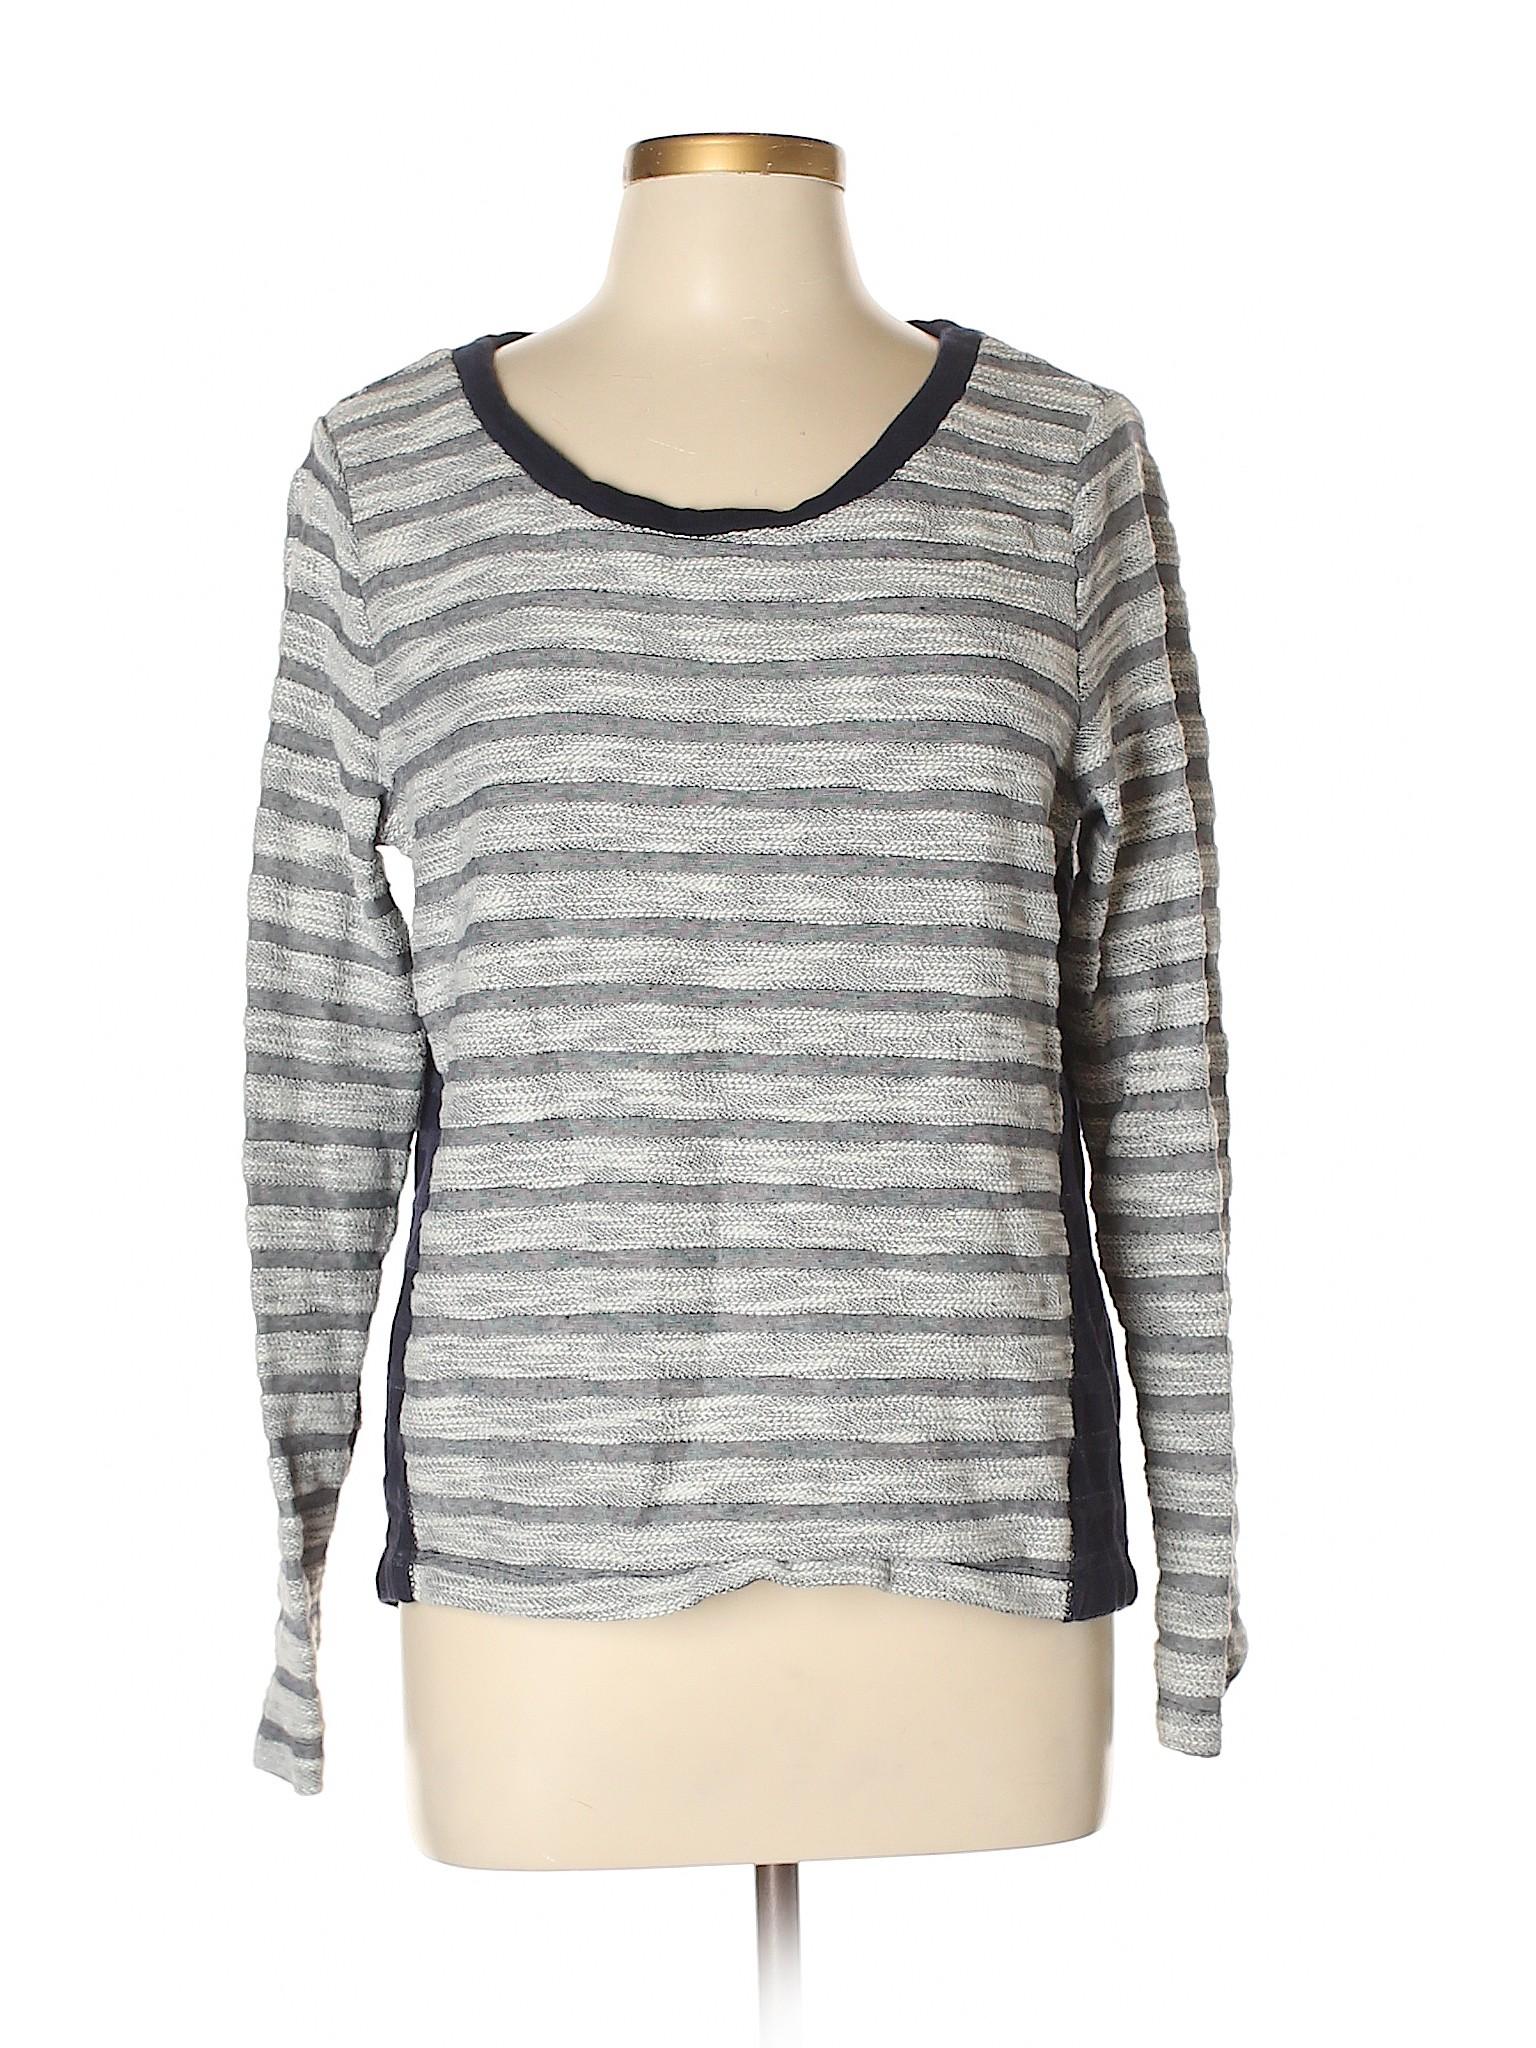 Gap Gap Boutique Sweater Pullover Boutique Gap Boutique Pullover Sweater WqYtxEHZp